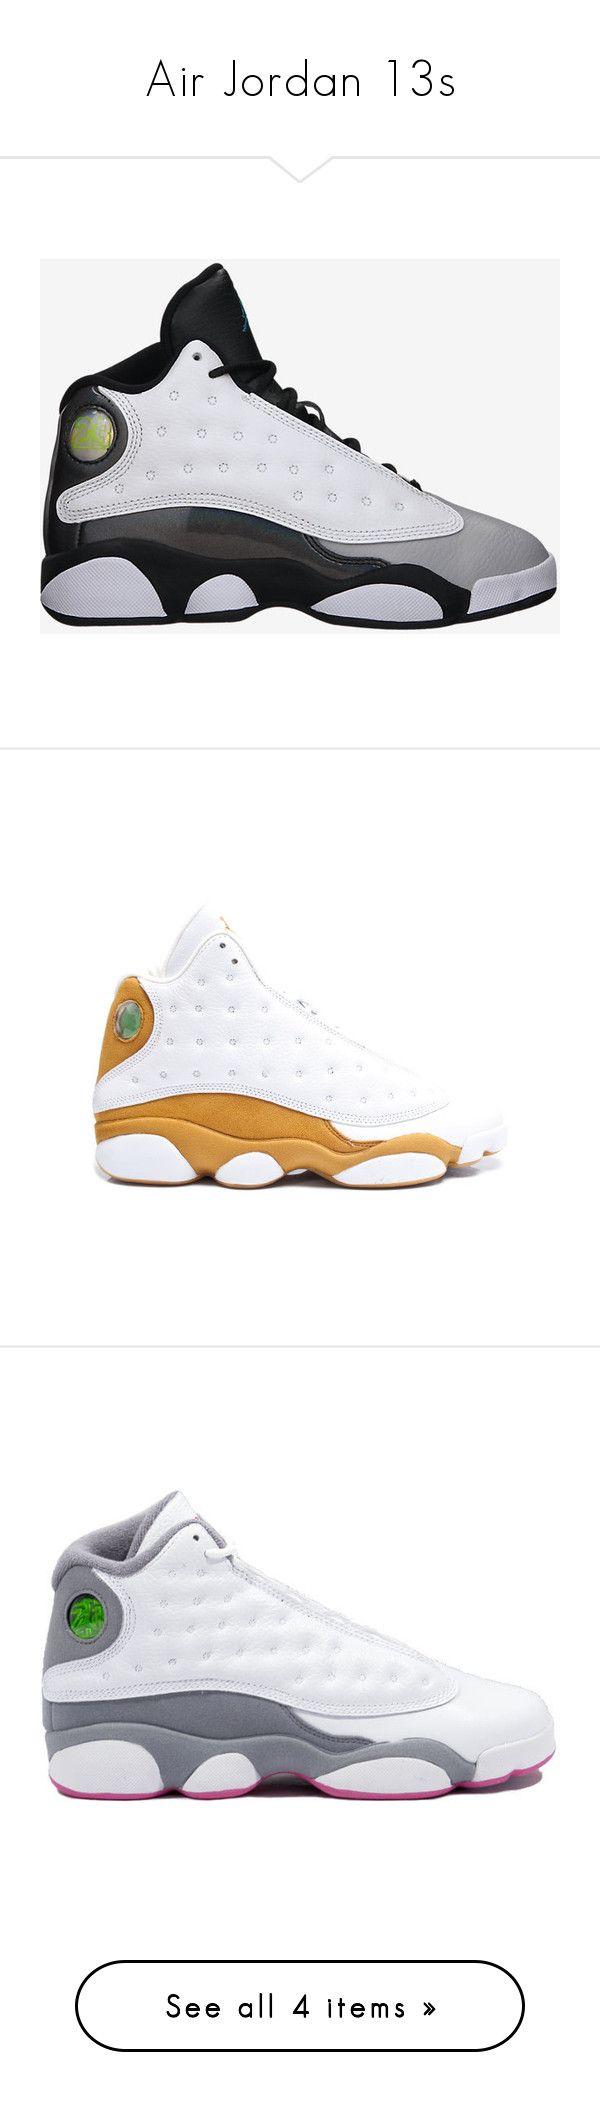 shoes, jordans, sneakers, jordan 13